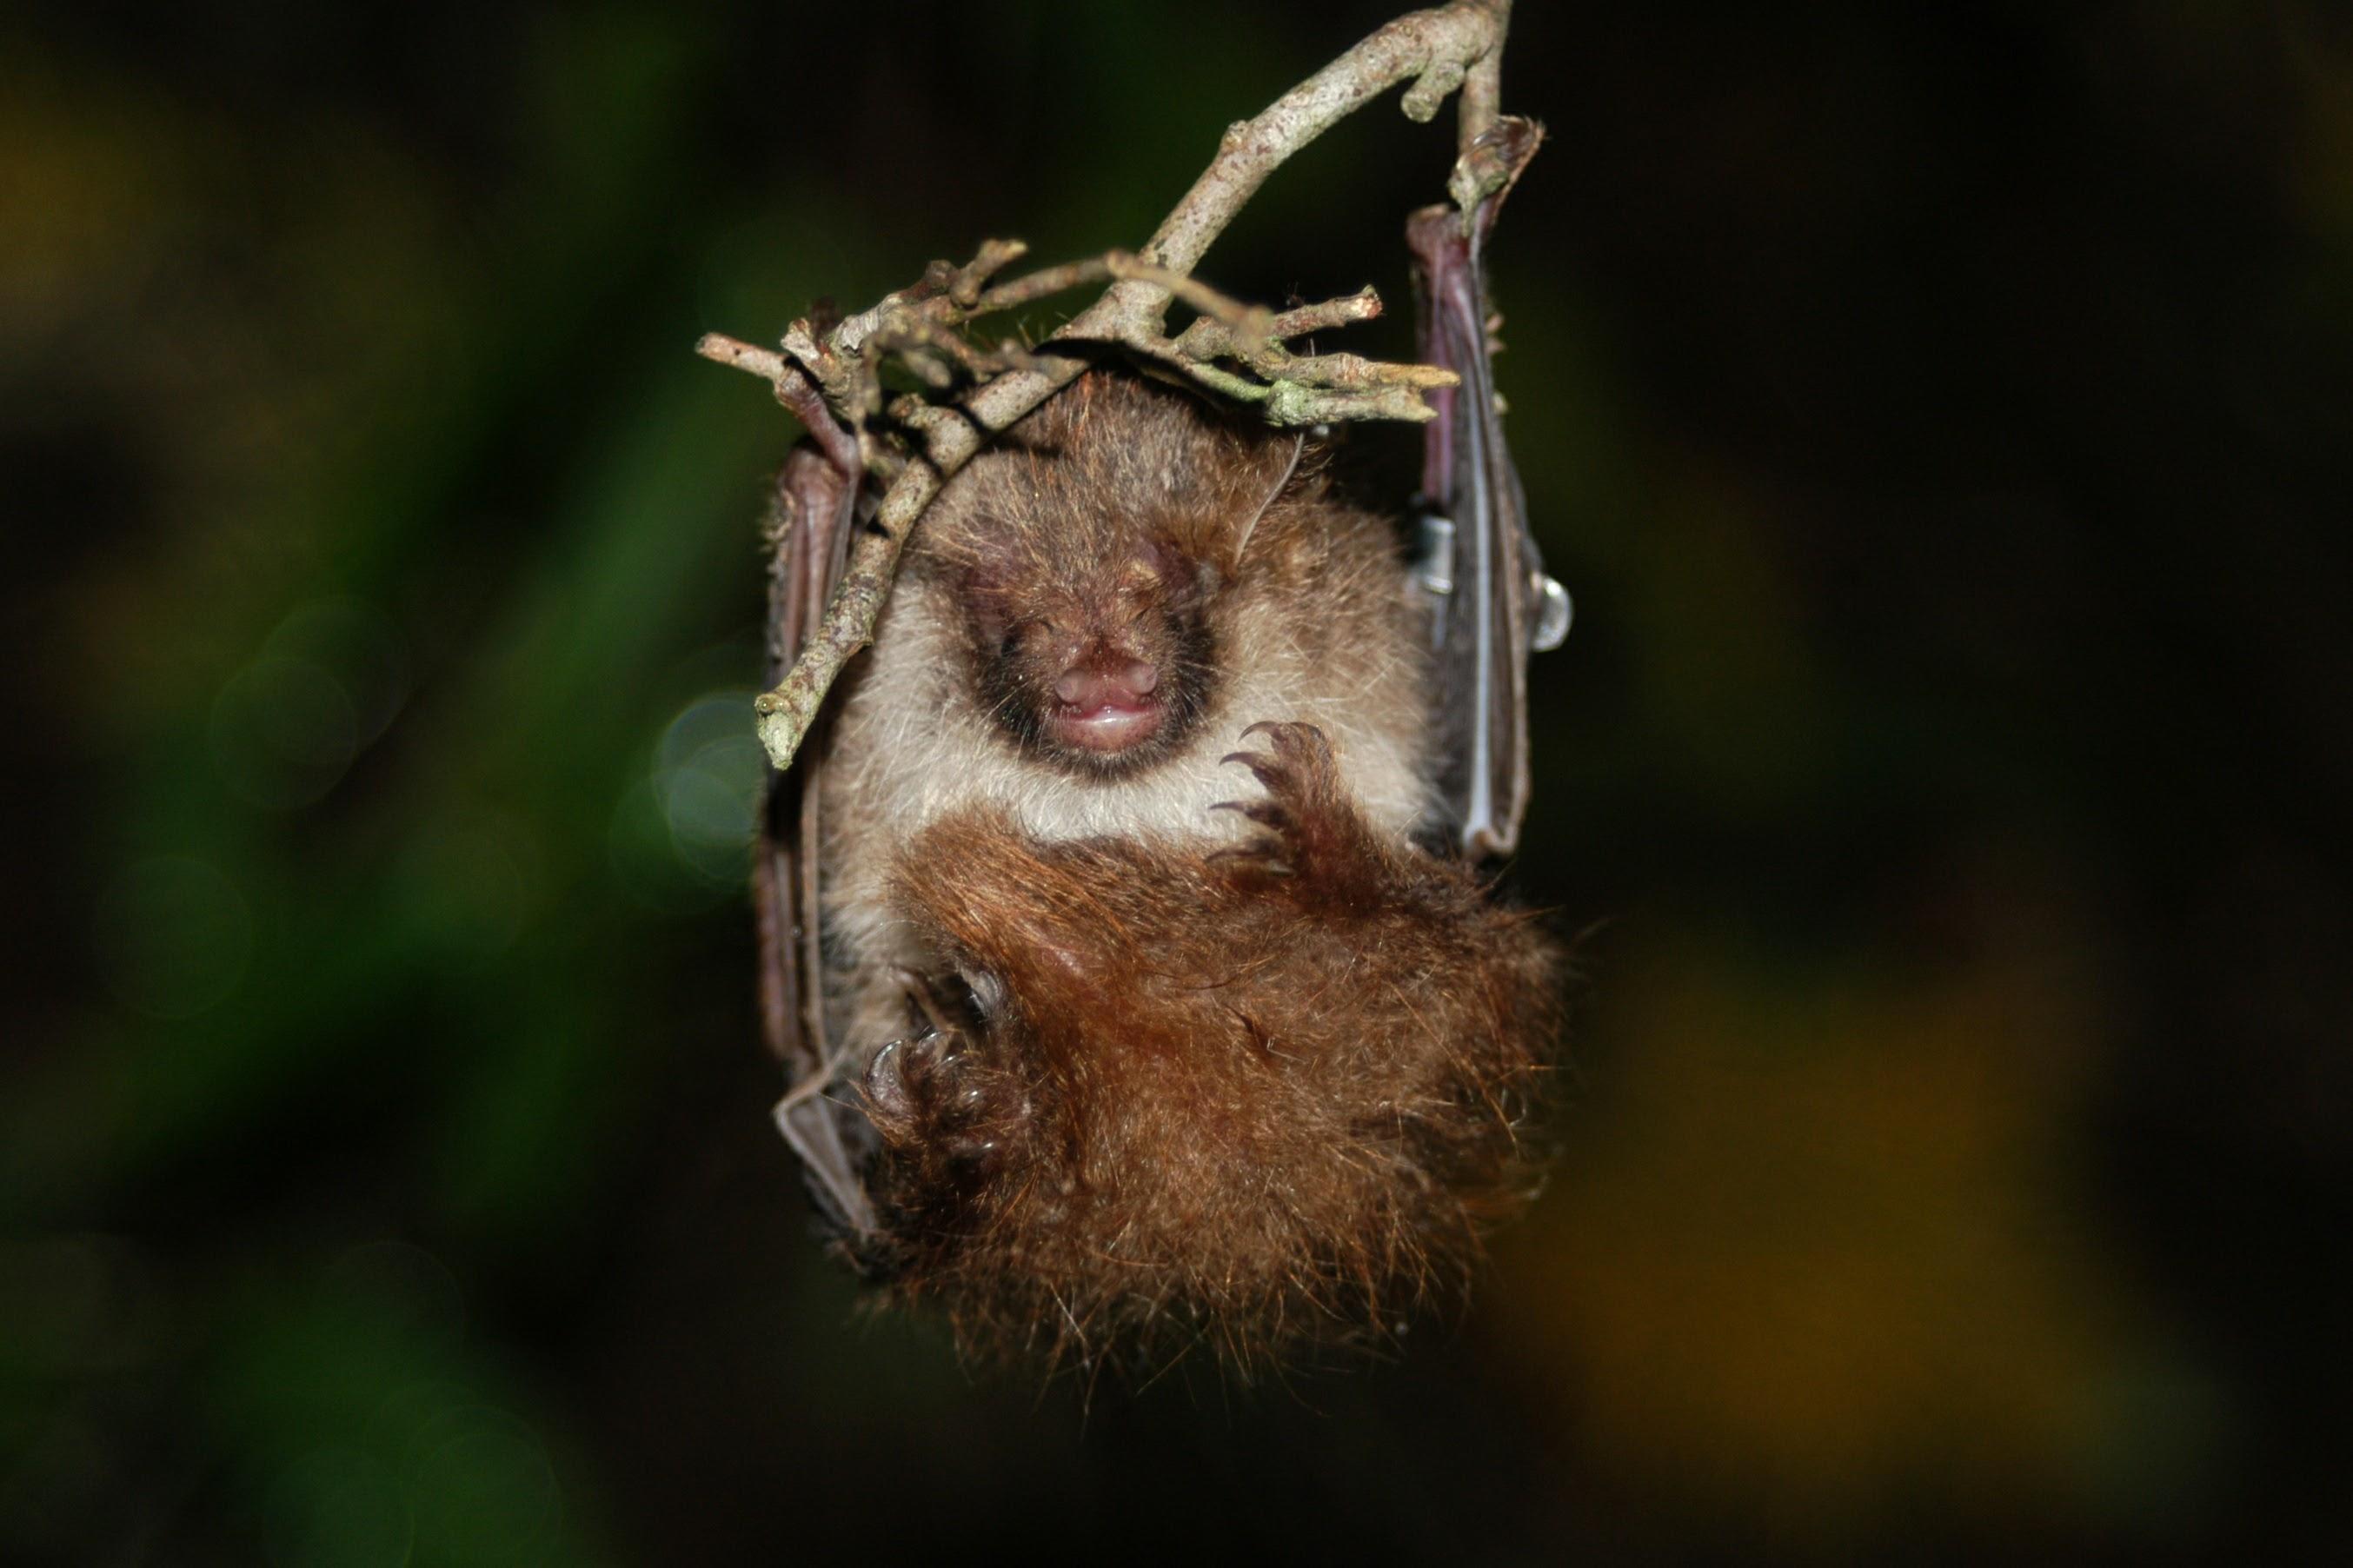 Ussuri Tube-Nosed Bat